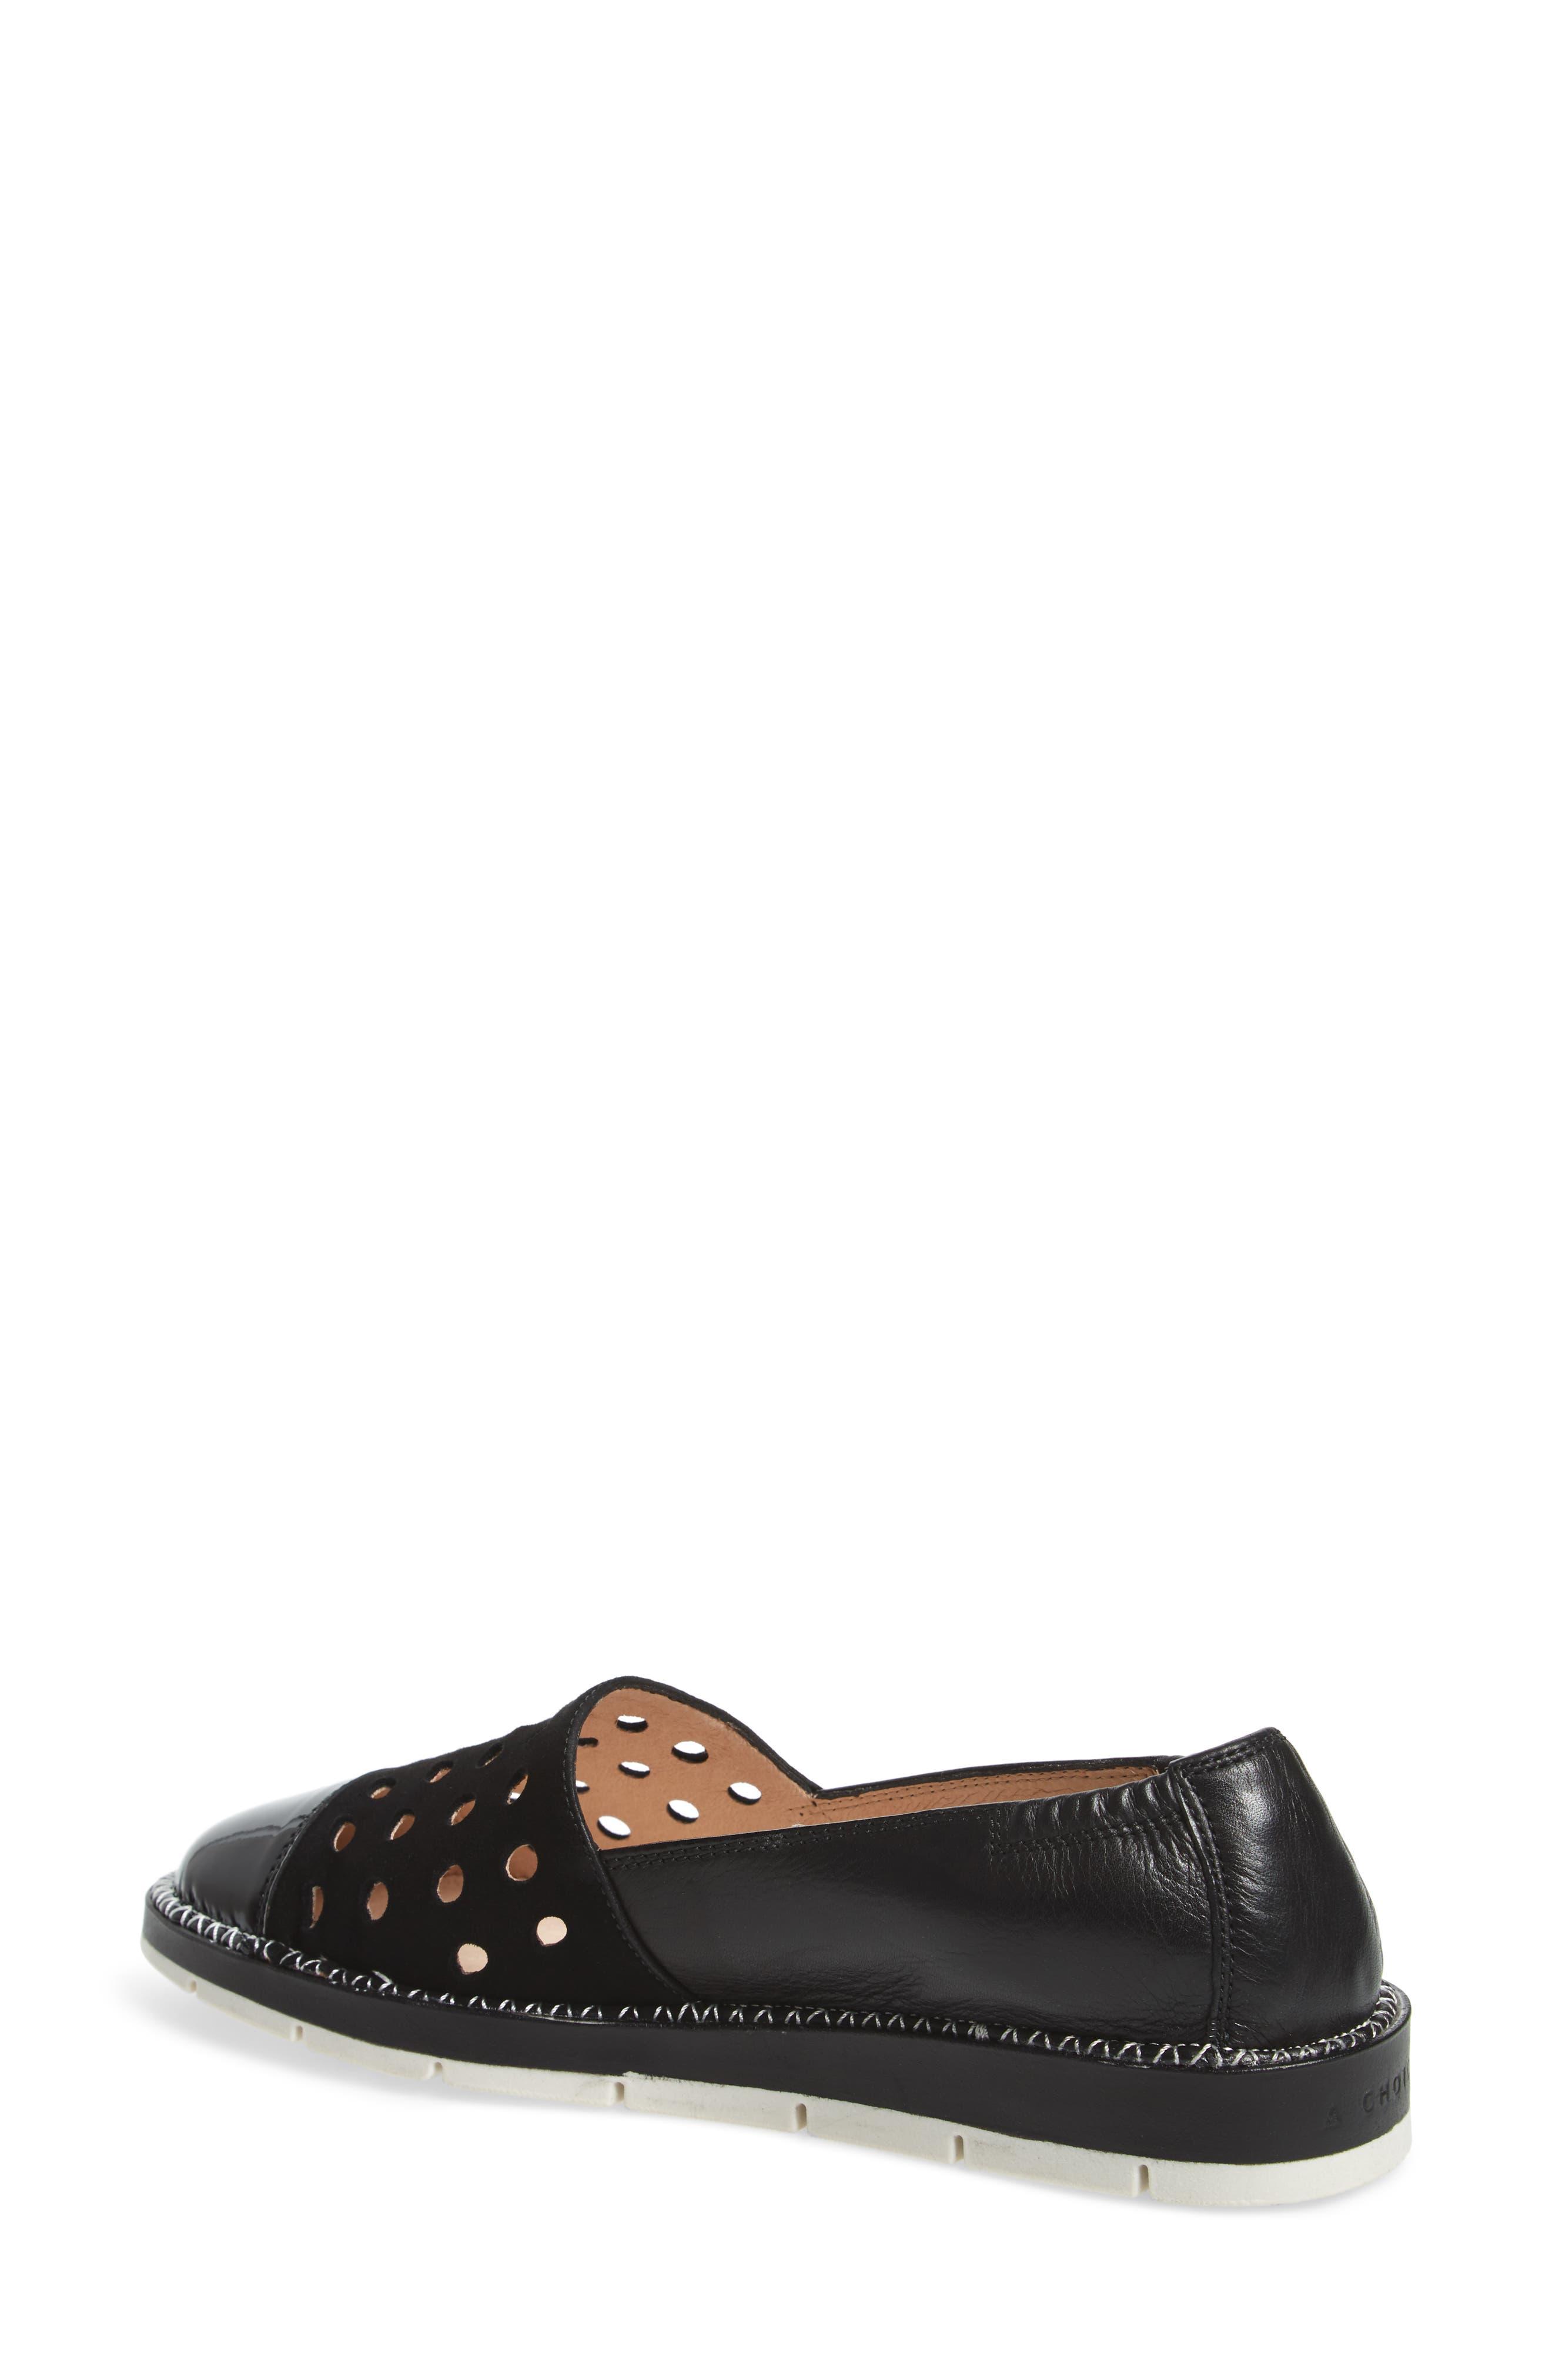 Maiko Flat,                             Alternate thumbnail 2, color,                             Kaffir Black Leather